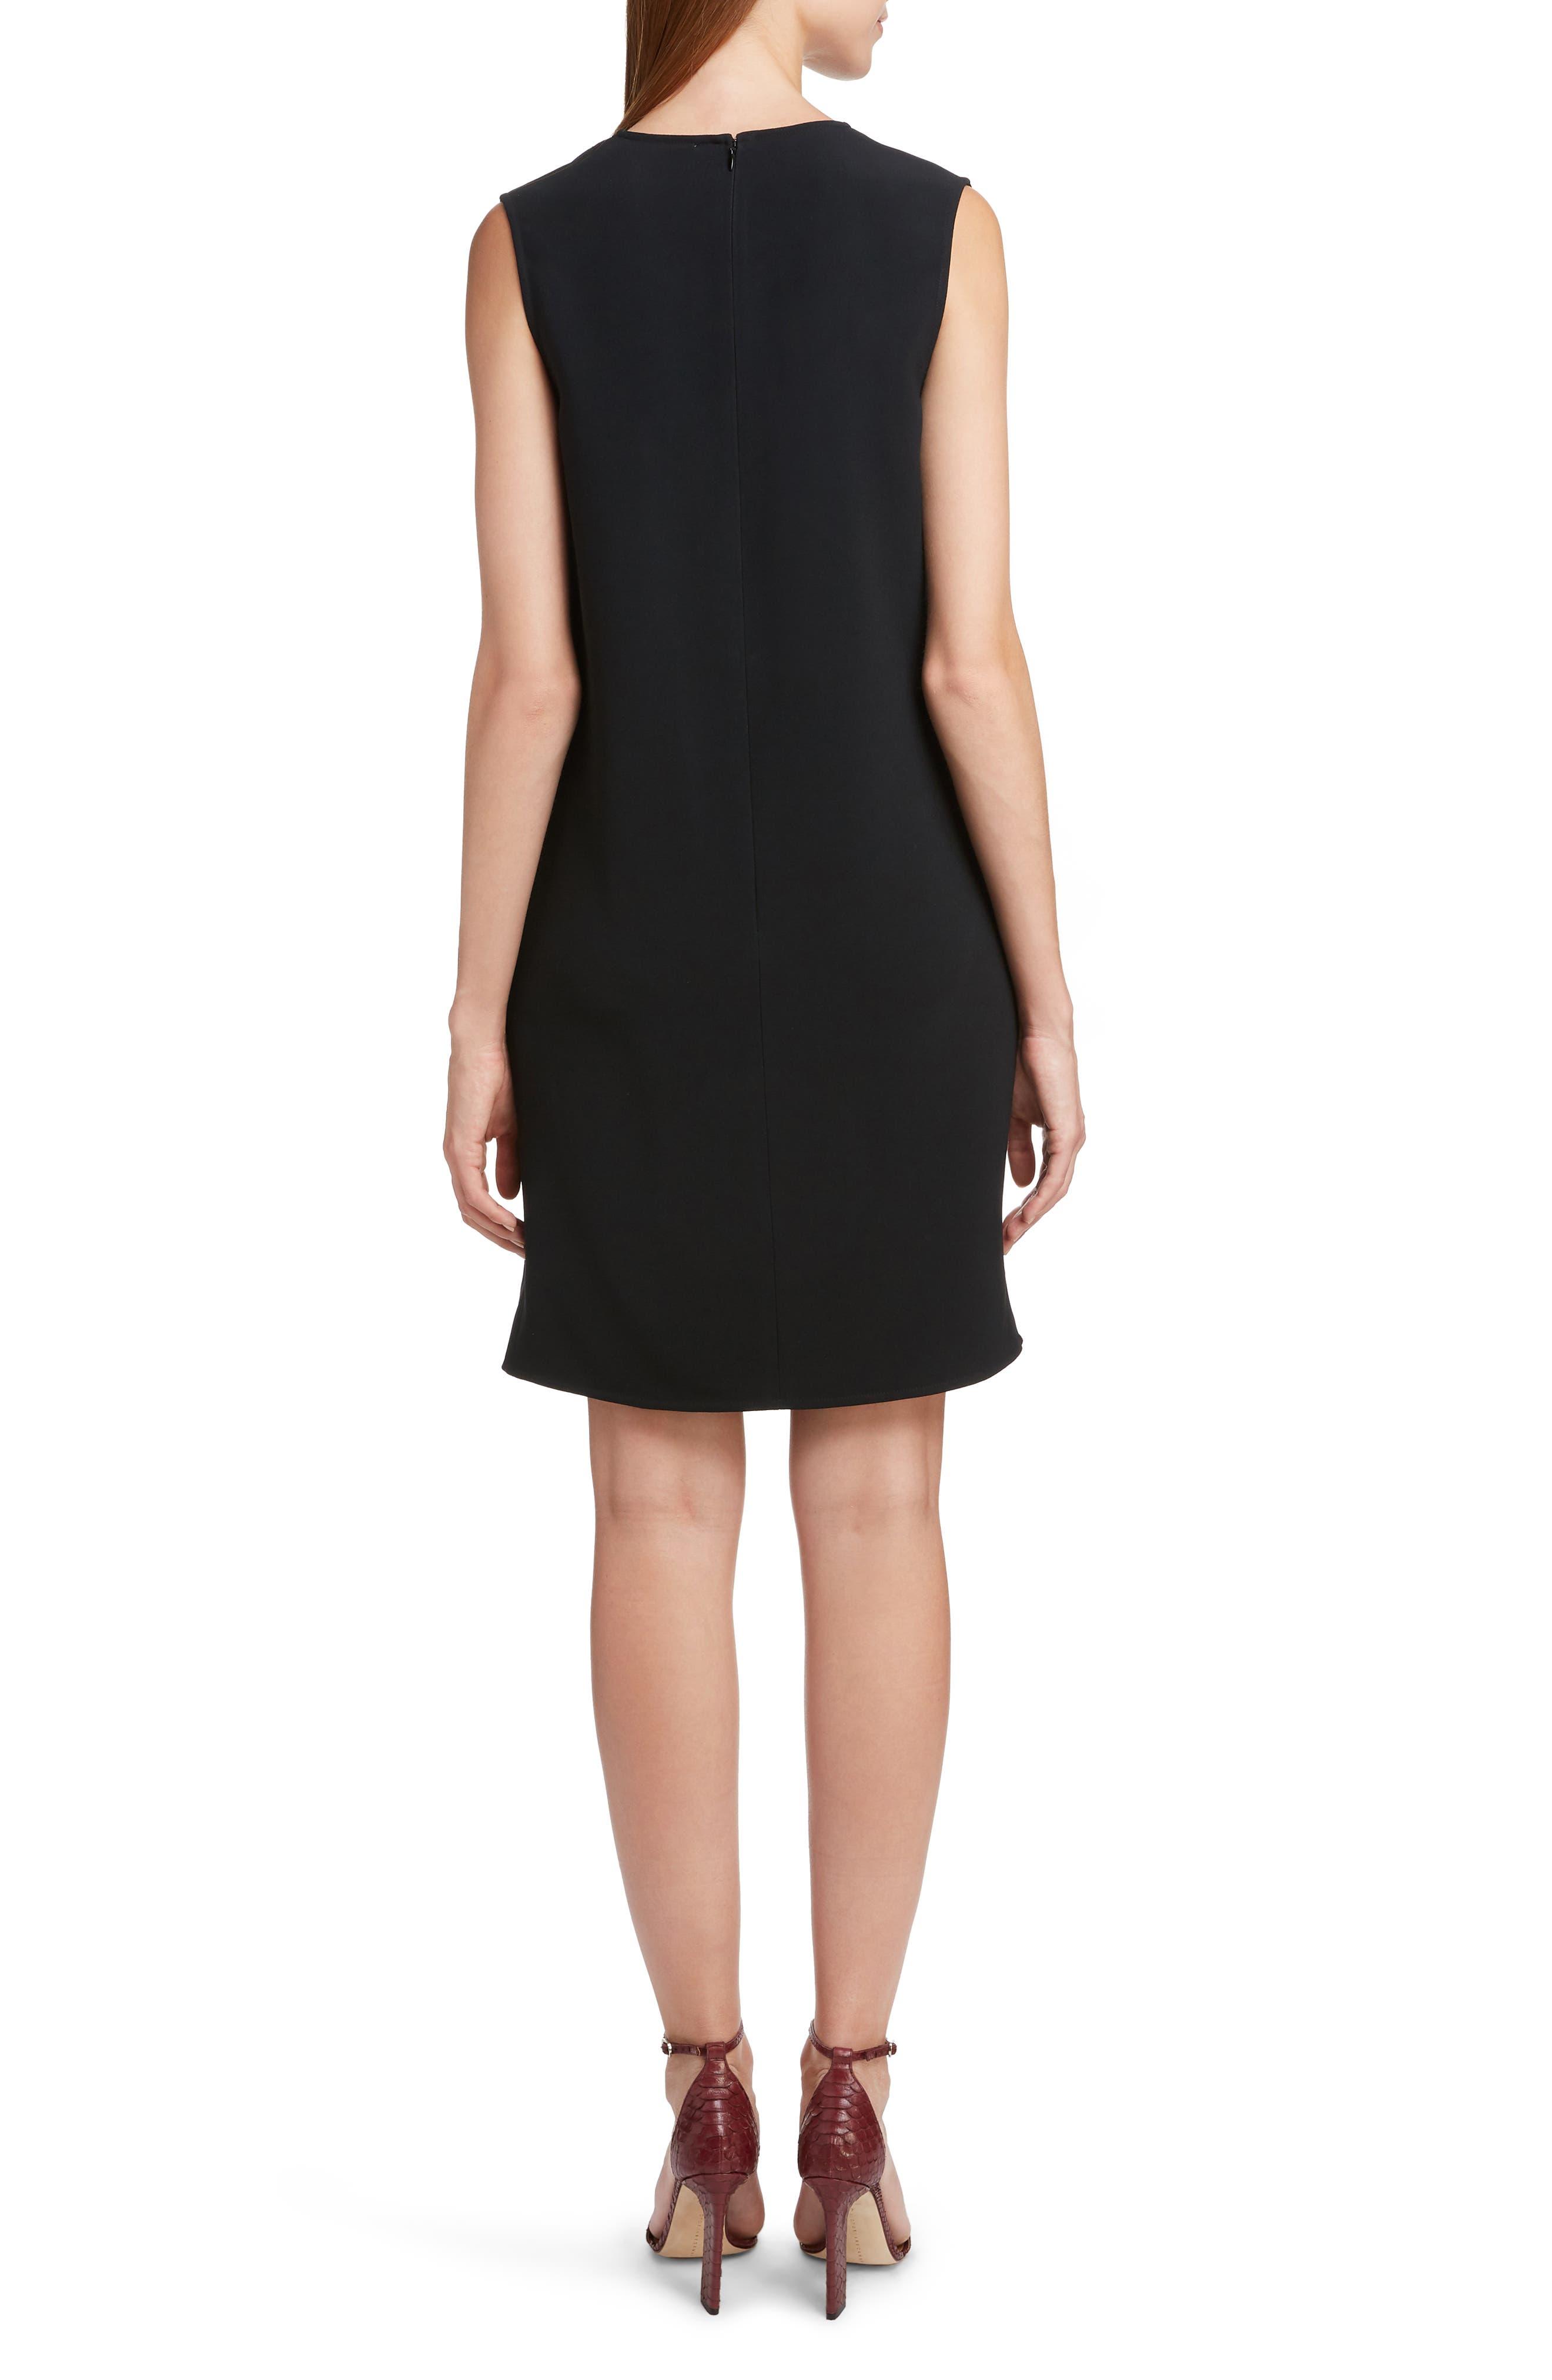 VICTORIA BECKHAM, Asymmetrical Pleat Shift Dress, Alternate thumbnail 2, color, BLACK